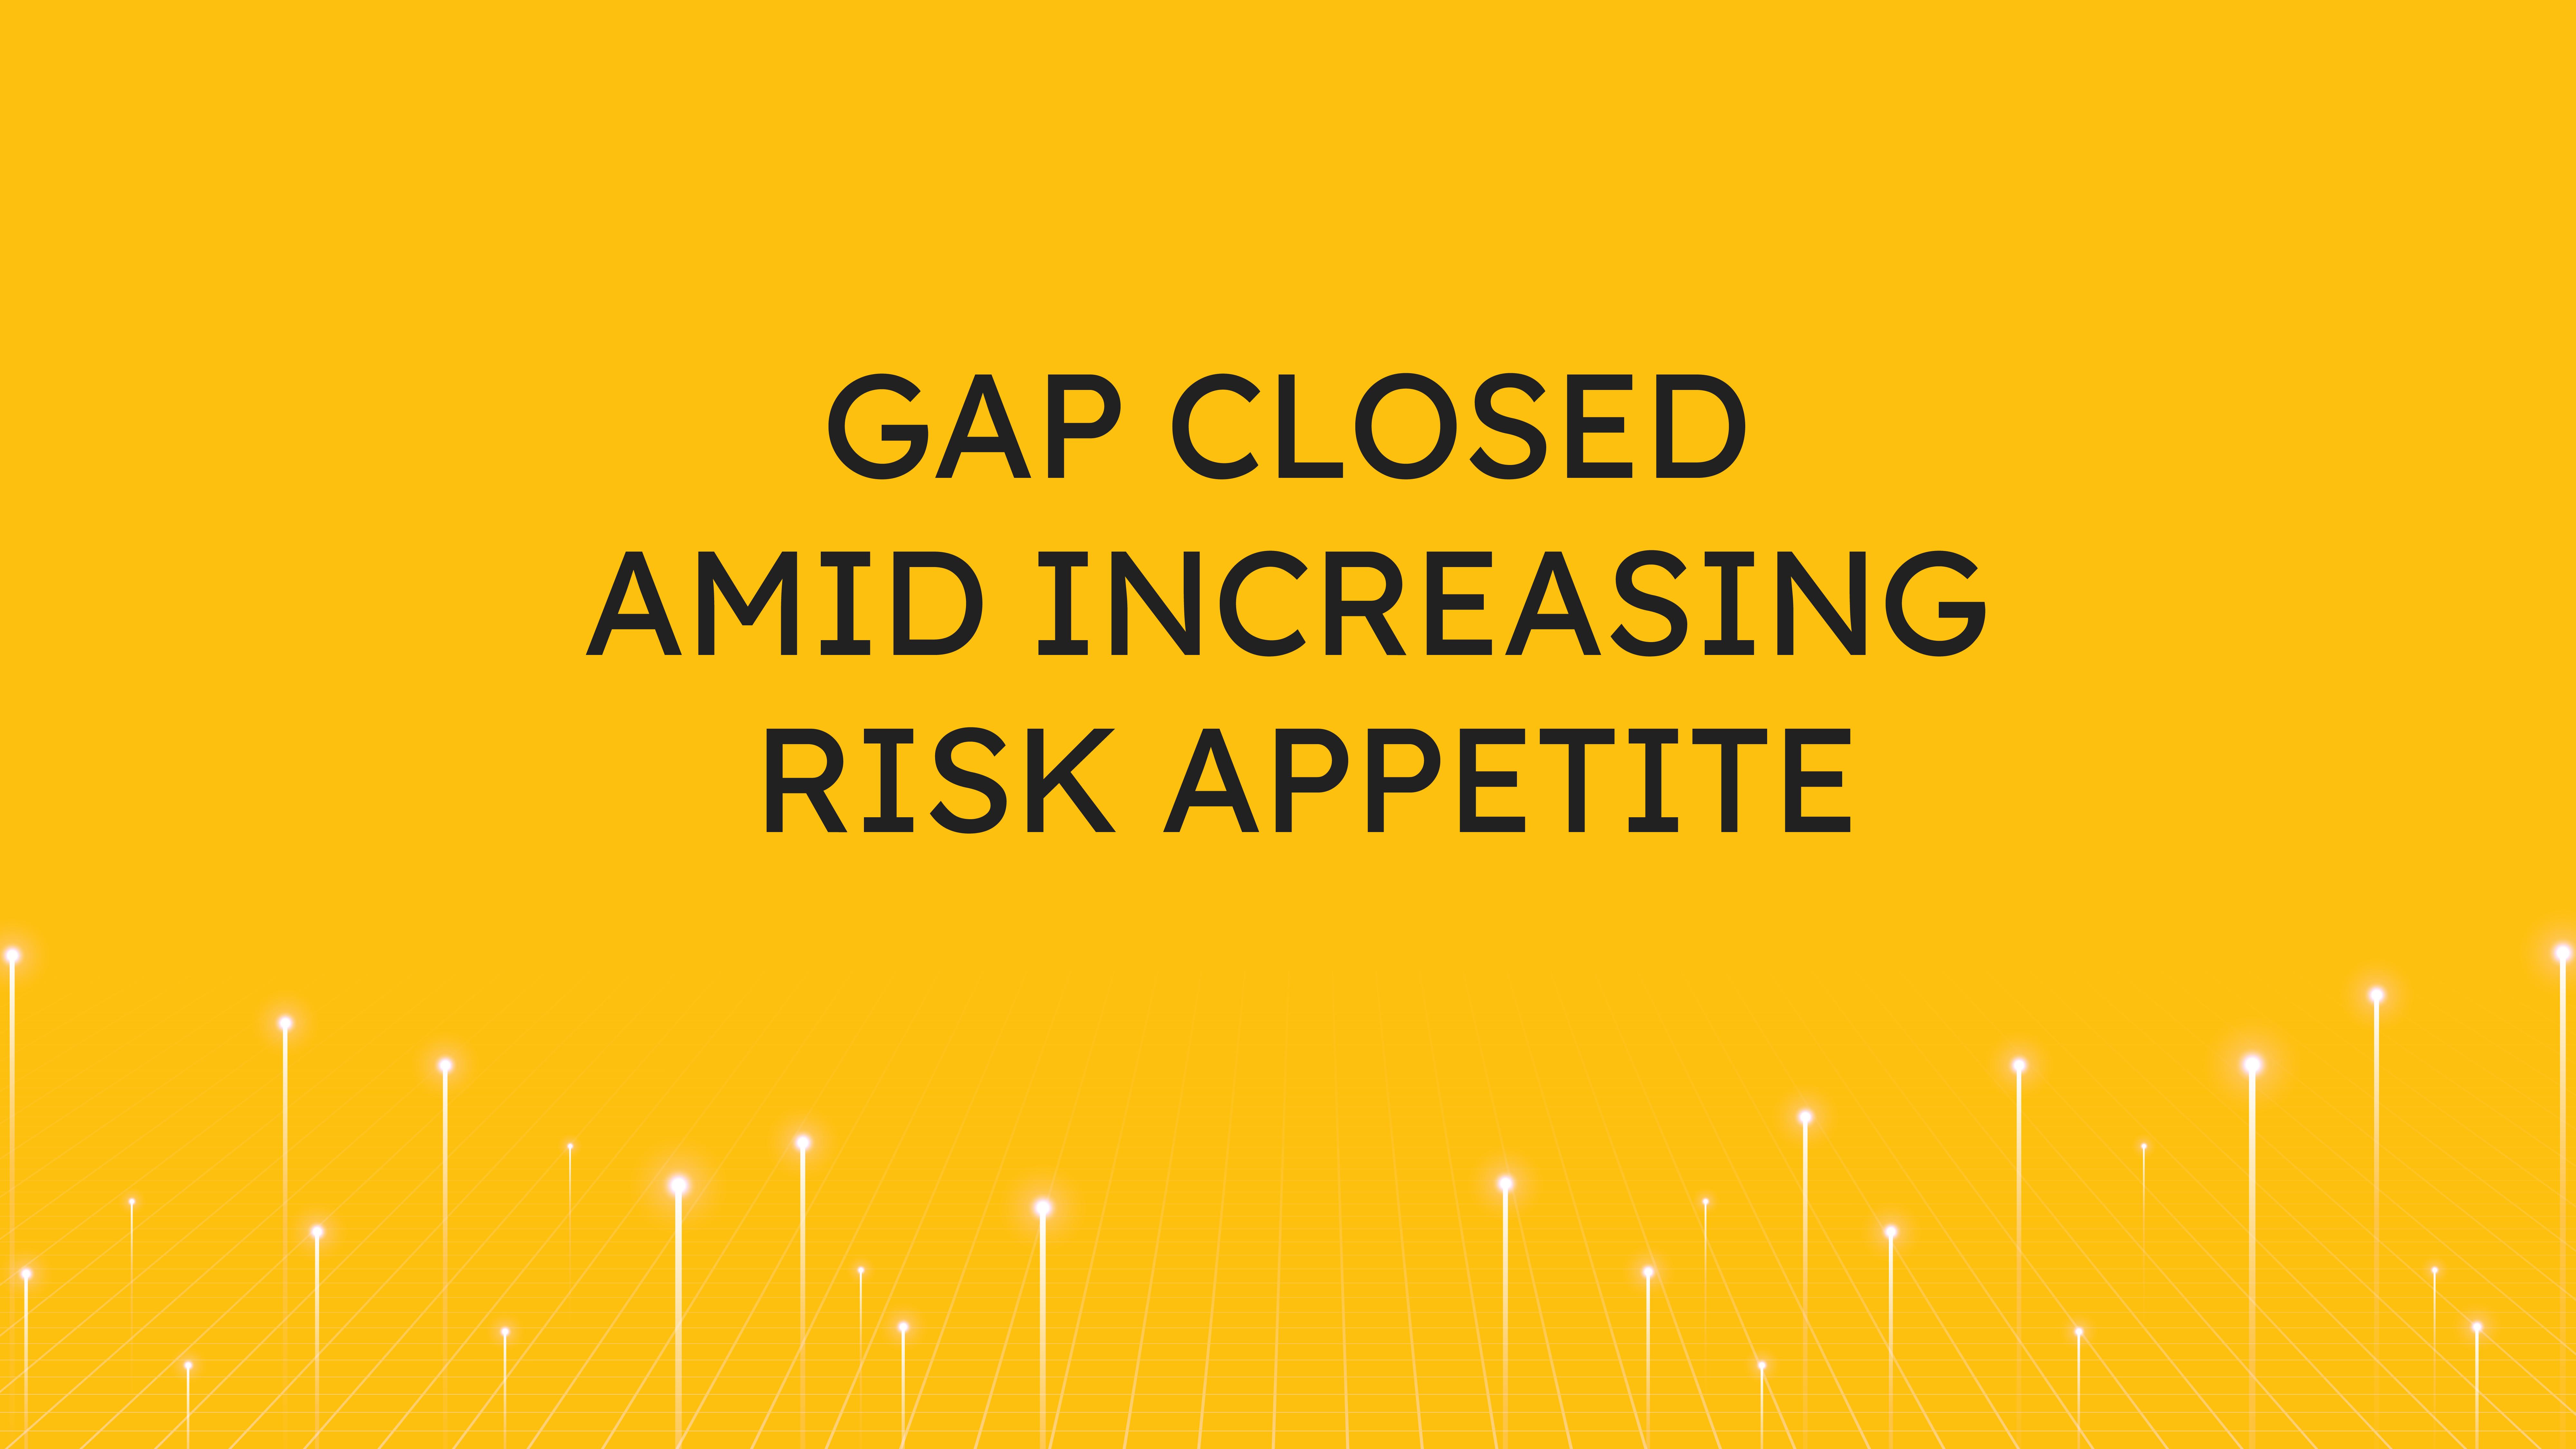 Gap Closed Amid  Increasing Risk Appetite